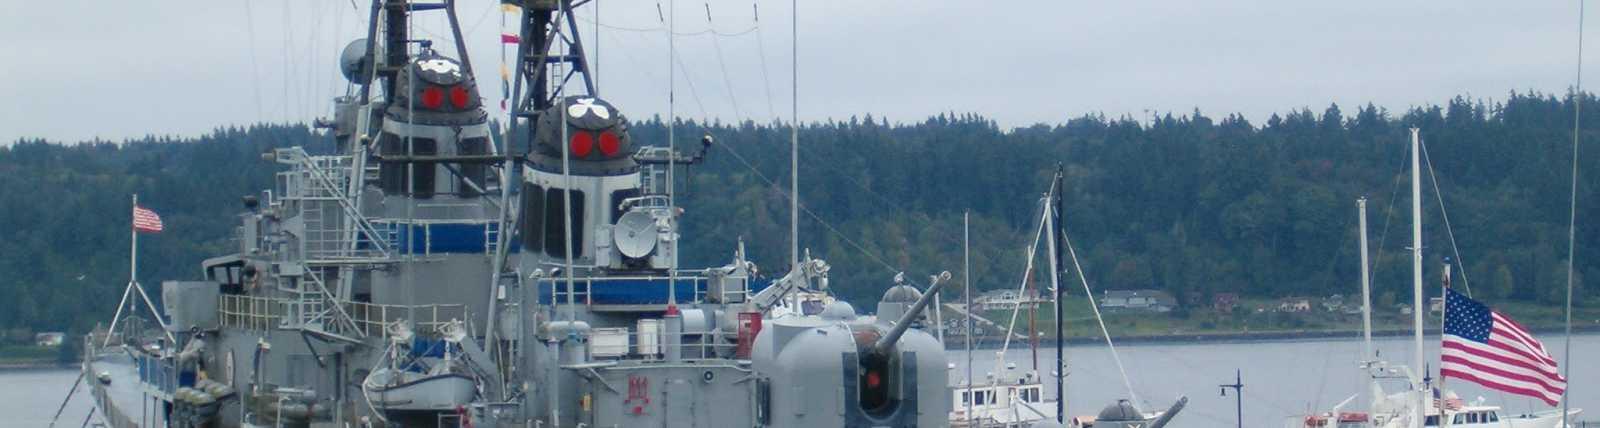 USS Turner Joy/Bremerton Historic Ship Association